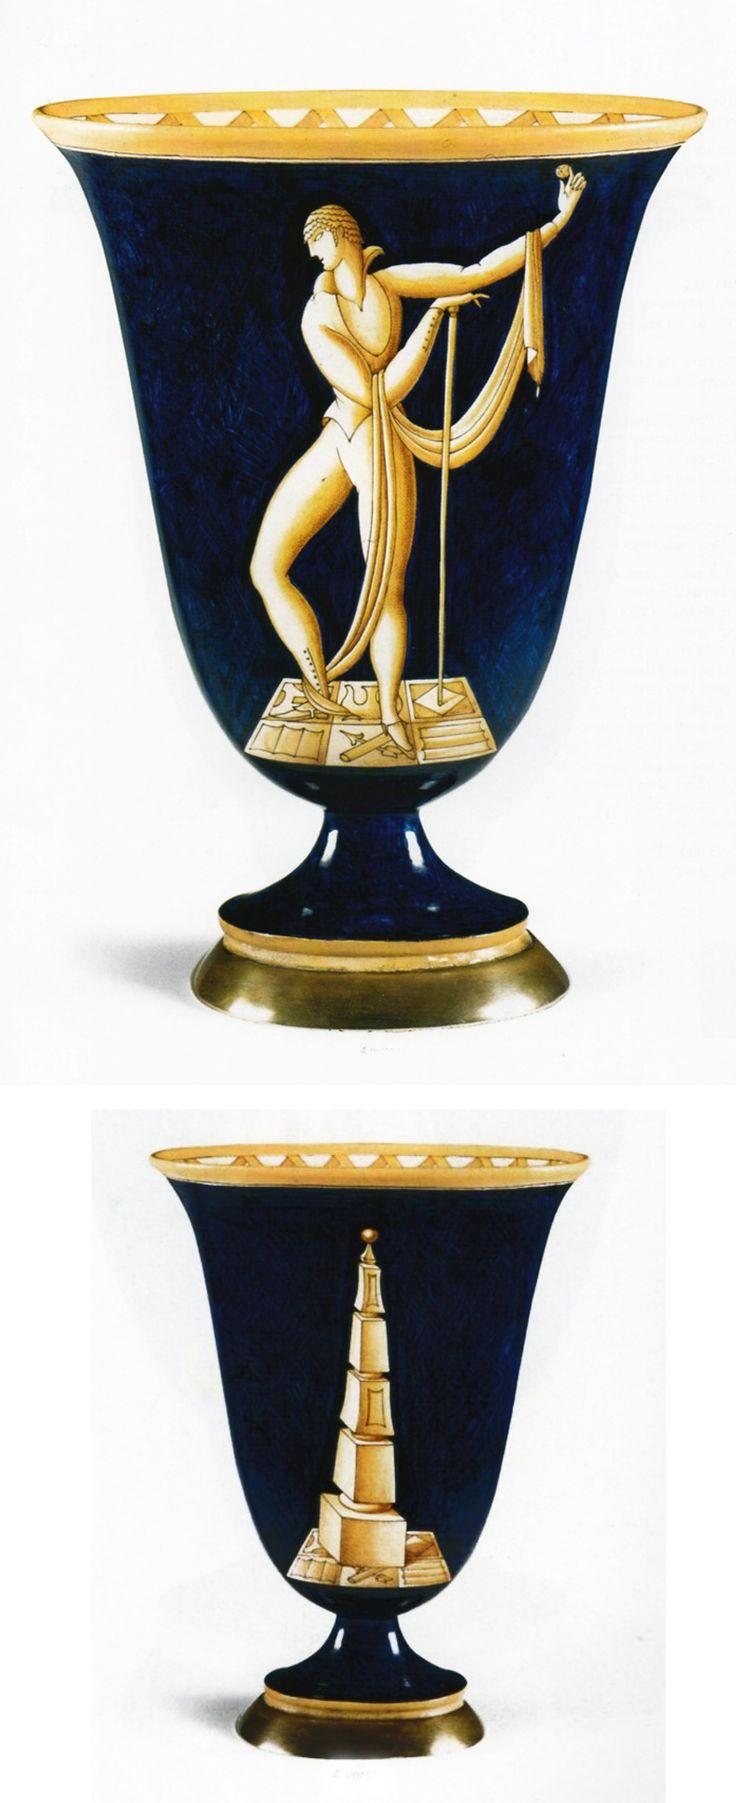 fornasetti vases for sale of 29 best gio ponti ginori images on pinterest gio ponti piero regarding gio ponti vase the dance teacher 1923 1930 erdina§ bakla